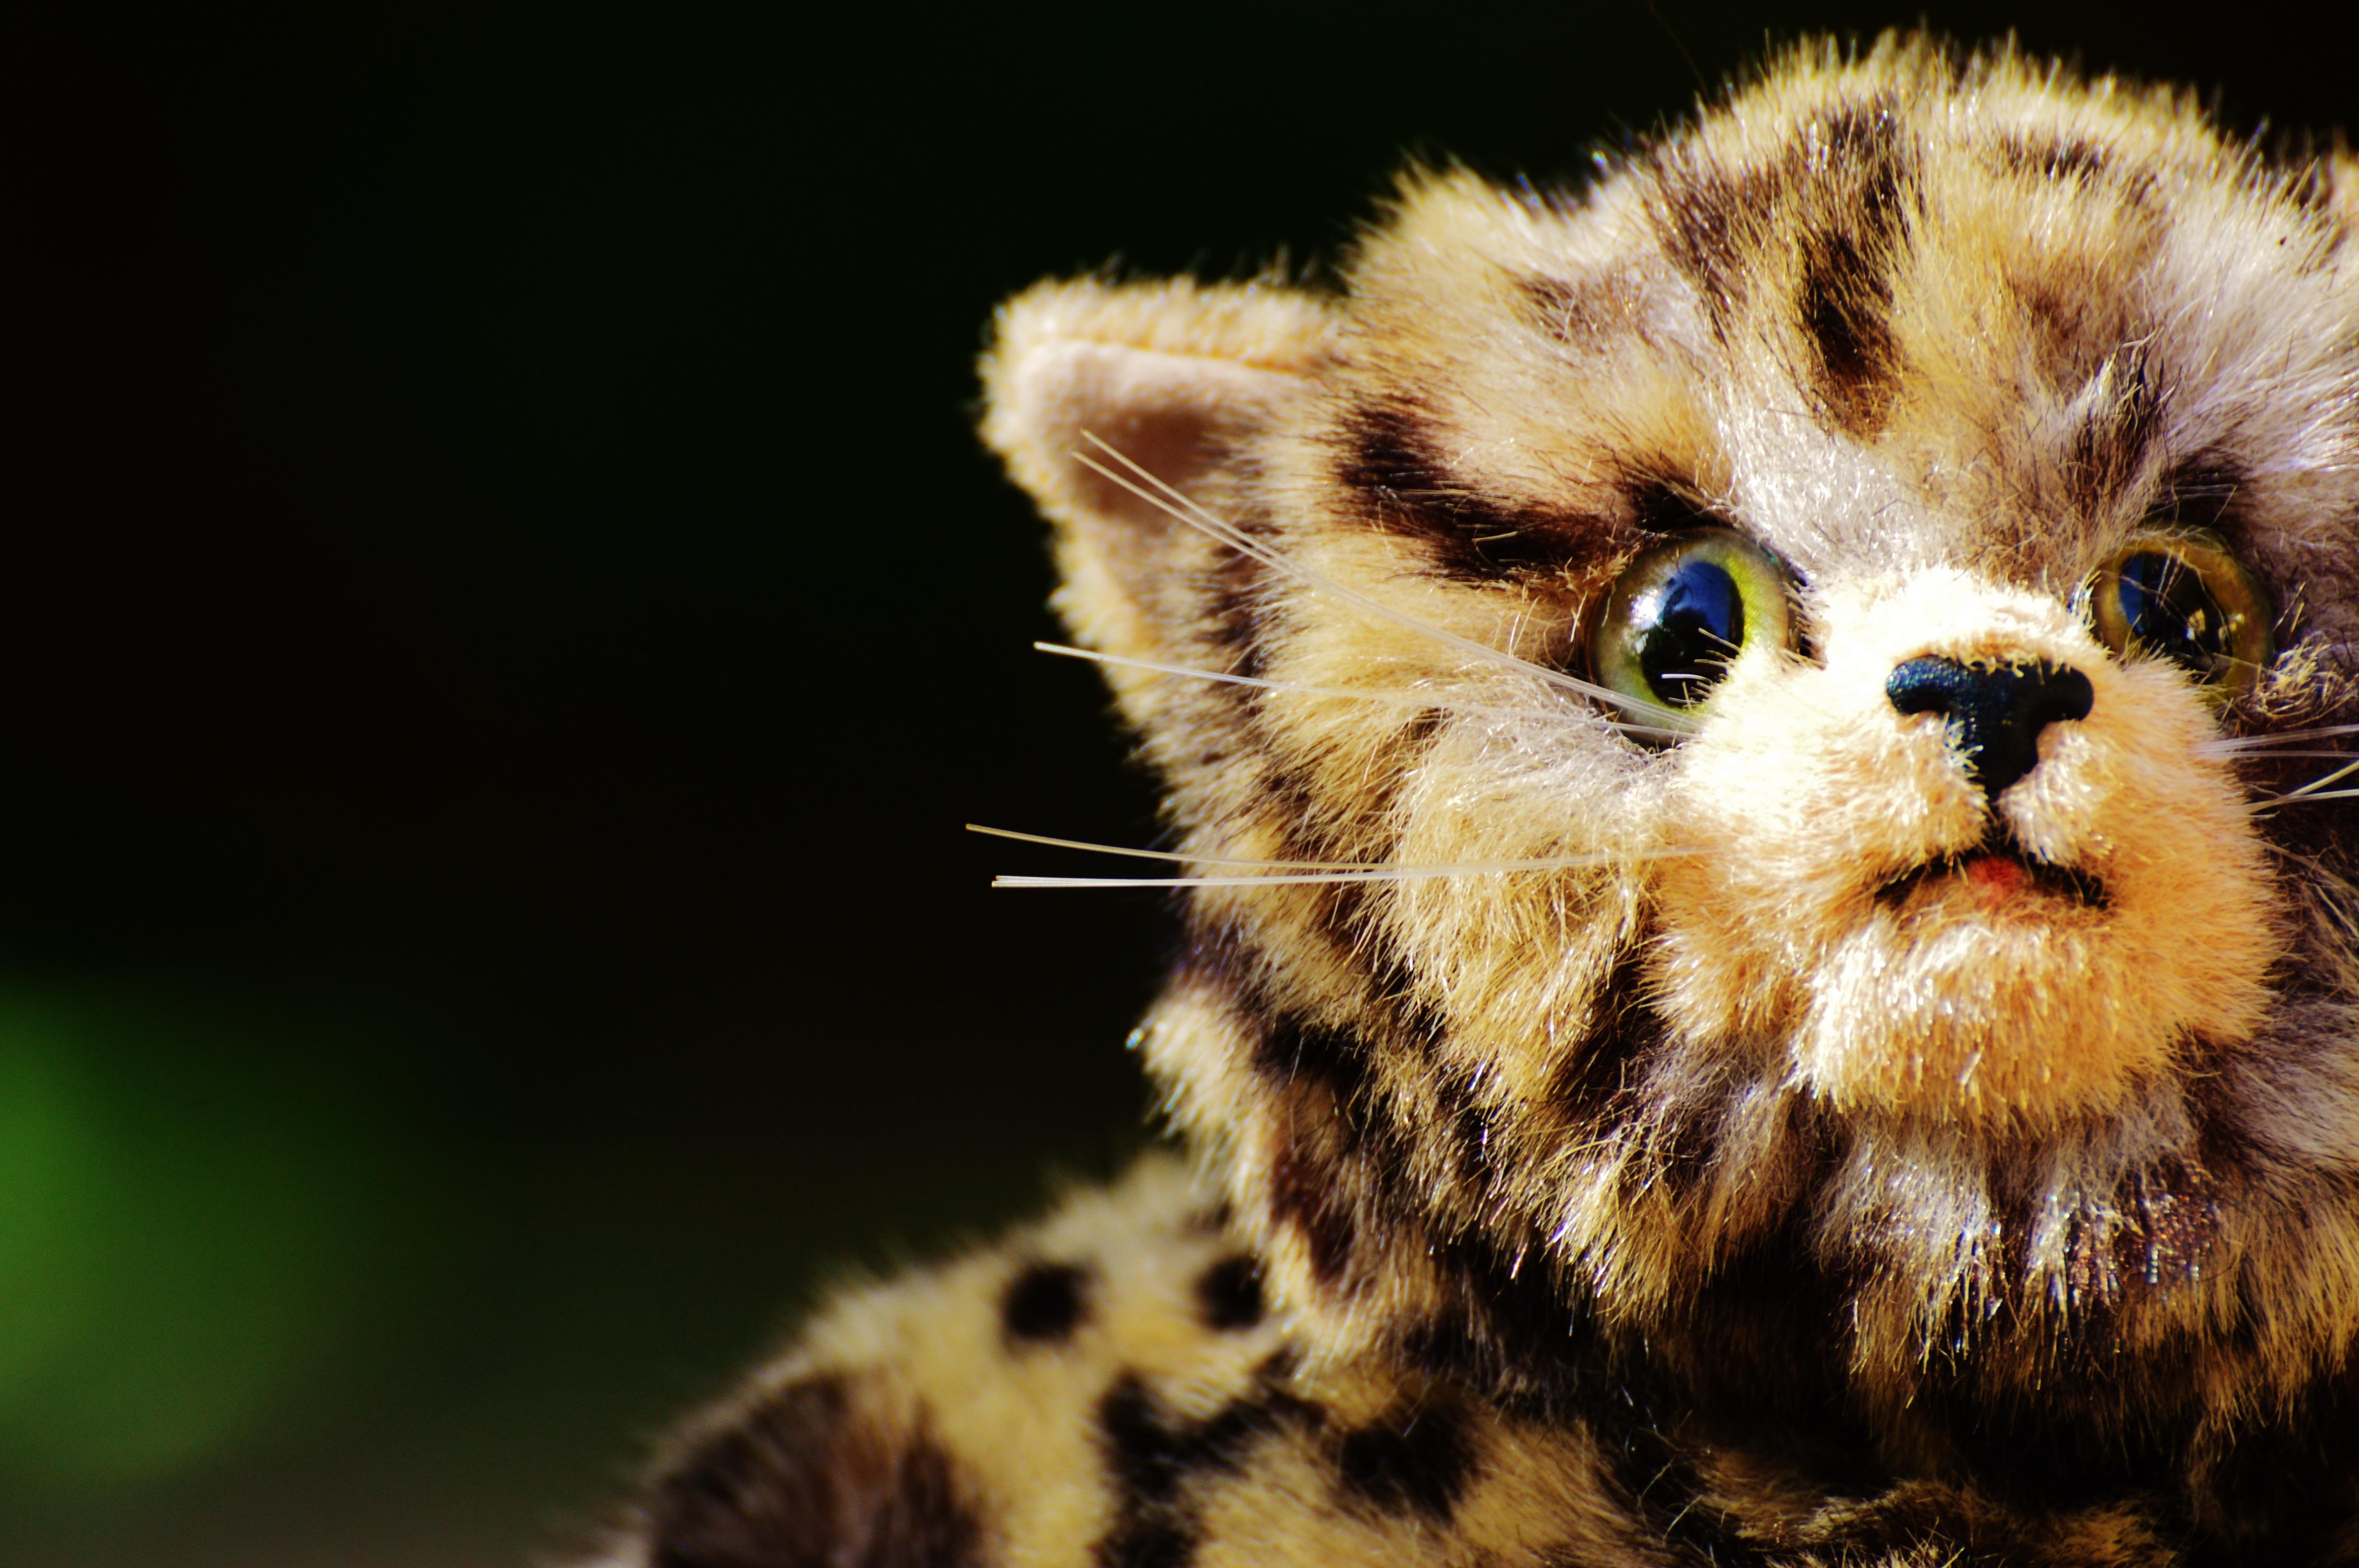 Free Images Cute Wildlife Kitten Fauna Teddy Bear Close Up